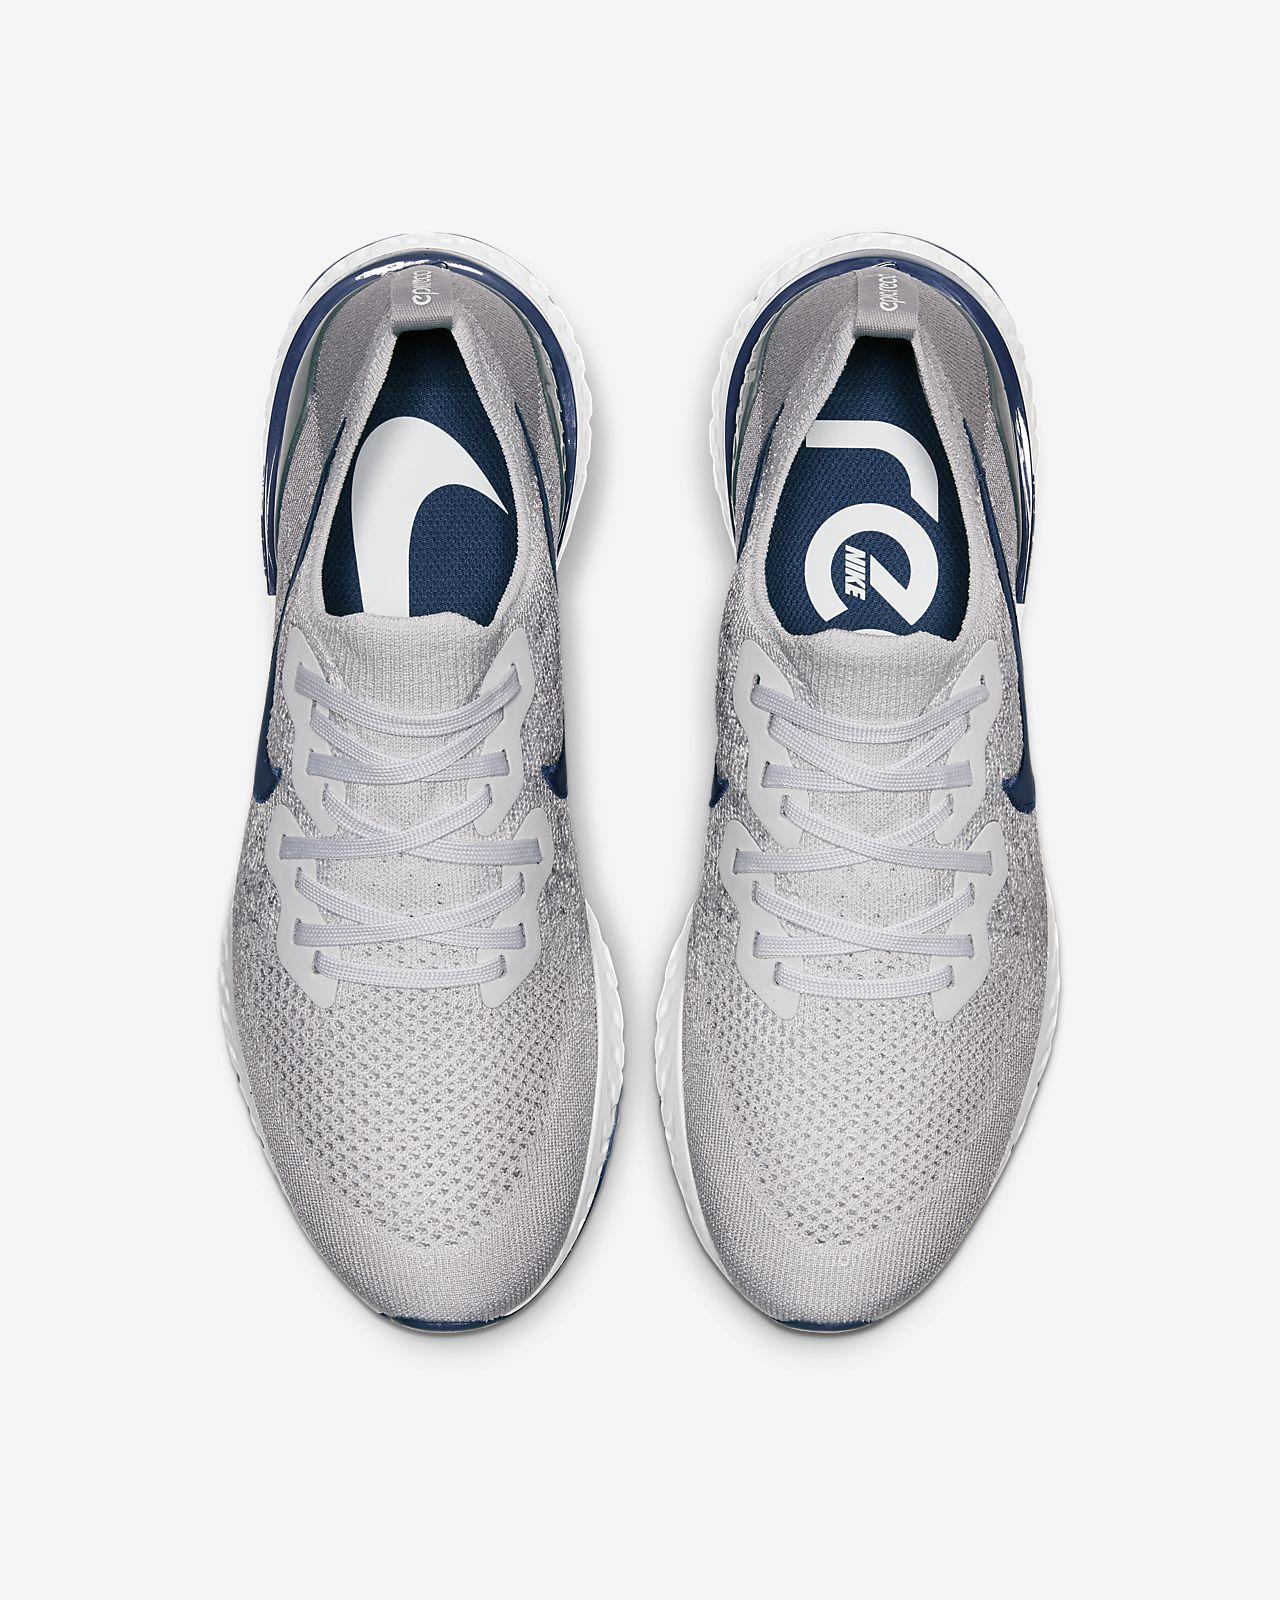 Rabatt Here's a close look at Adidas' Leistung 16.II and